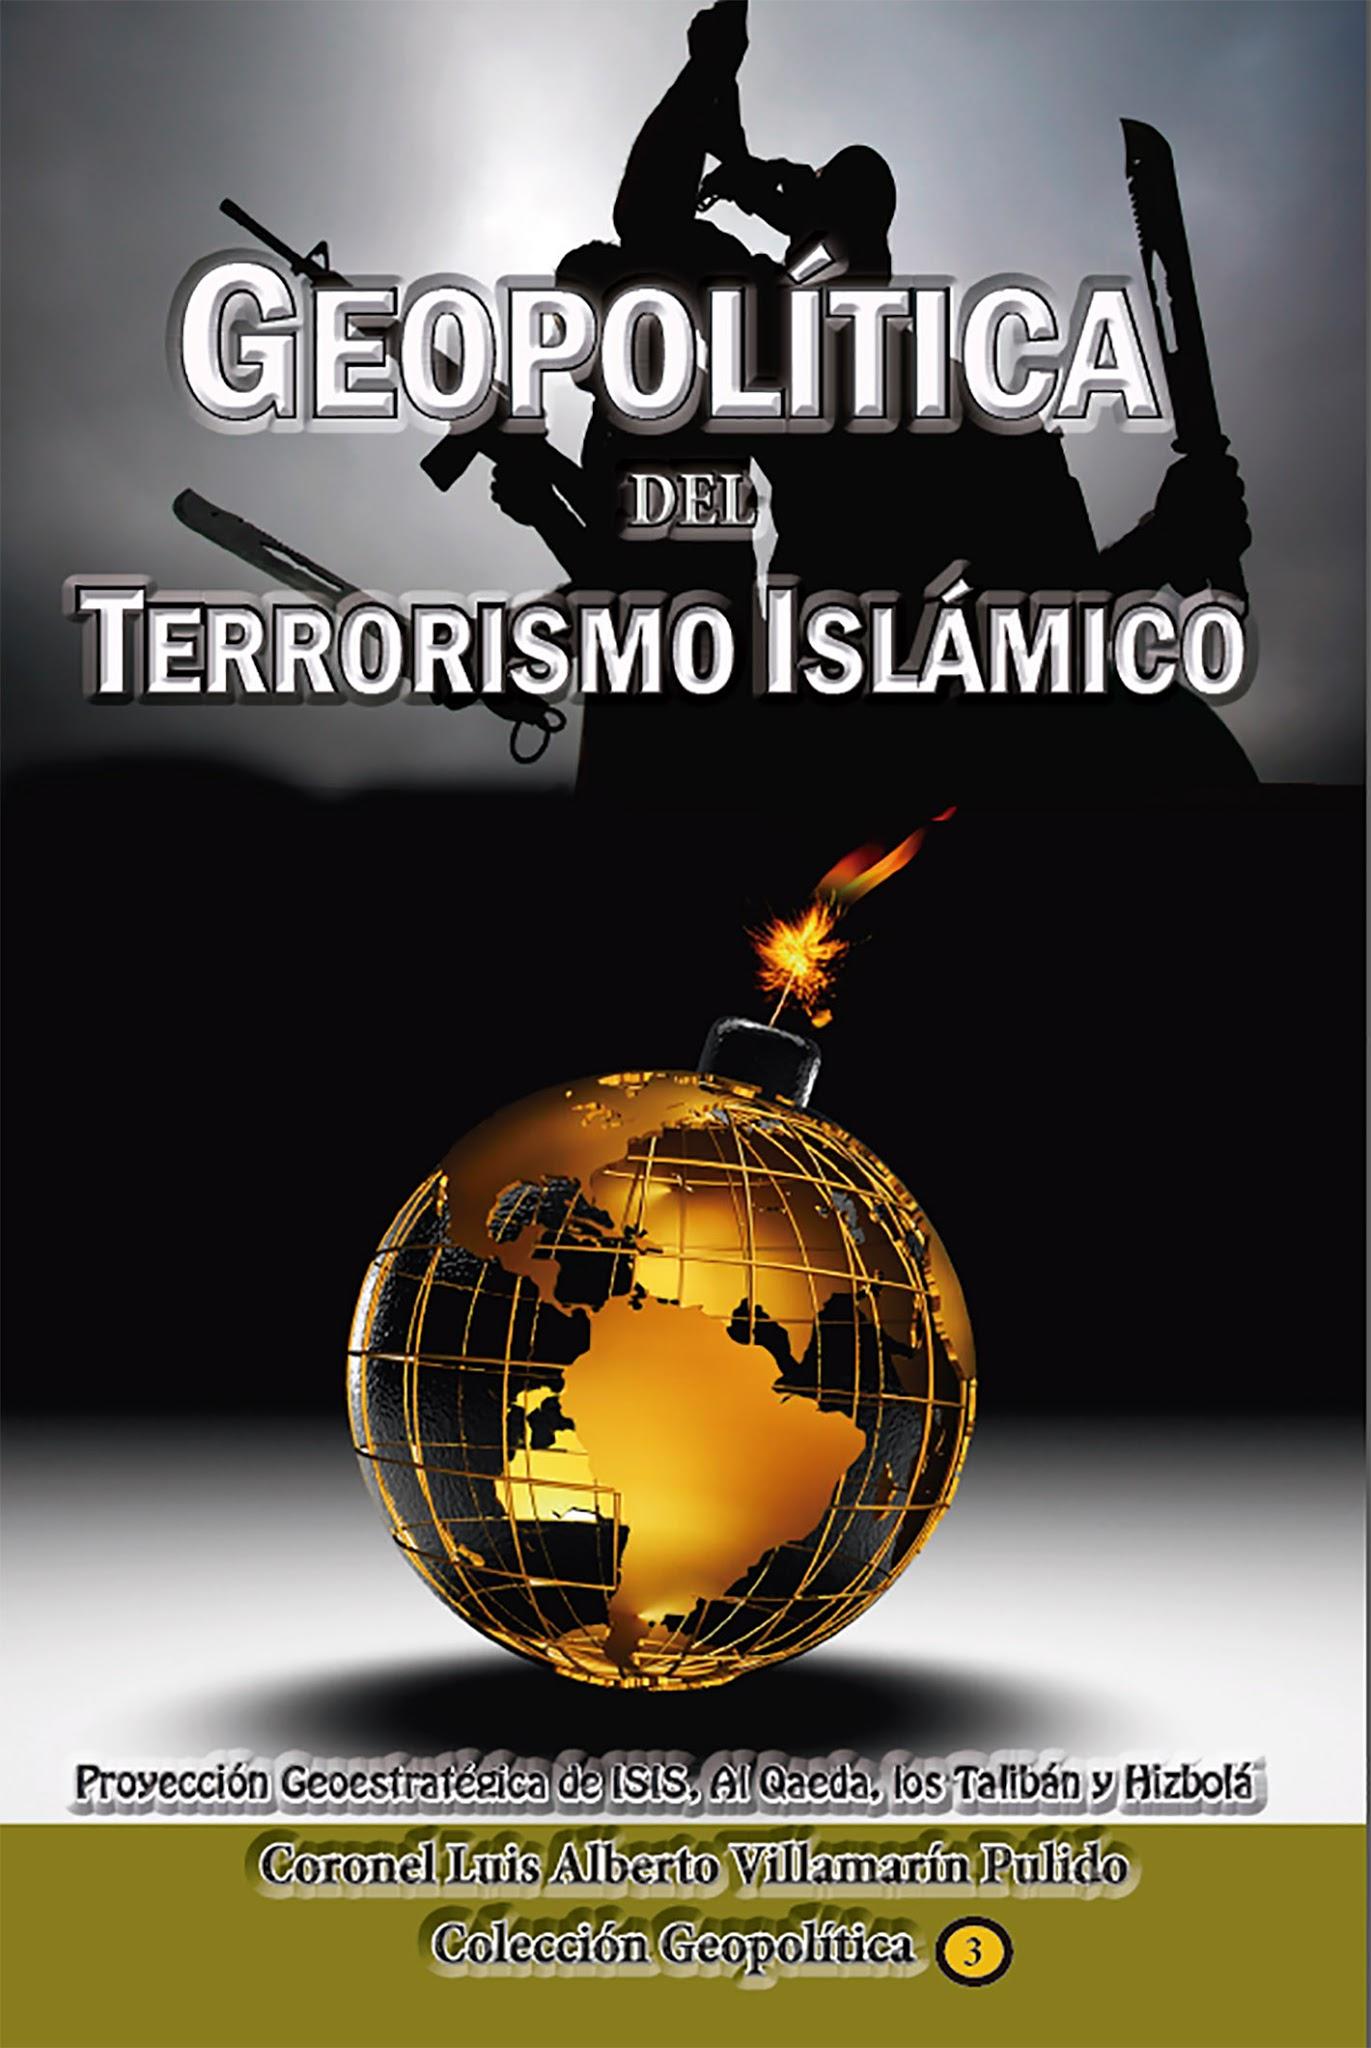 Isis-Estado-Islamico small